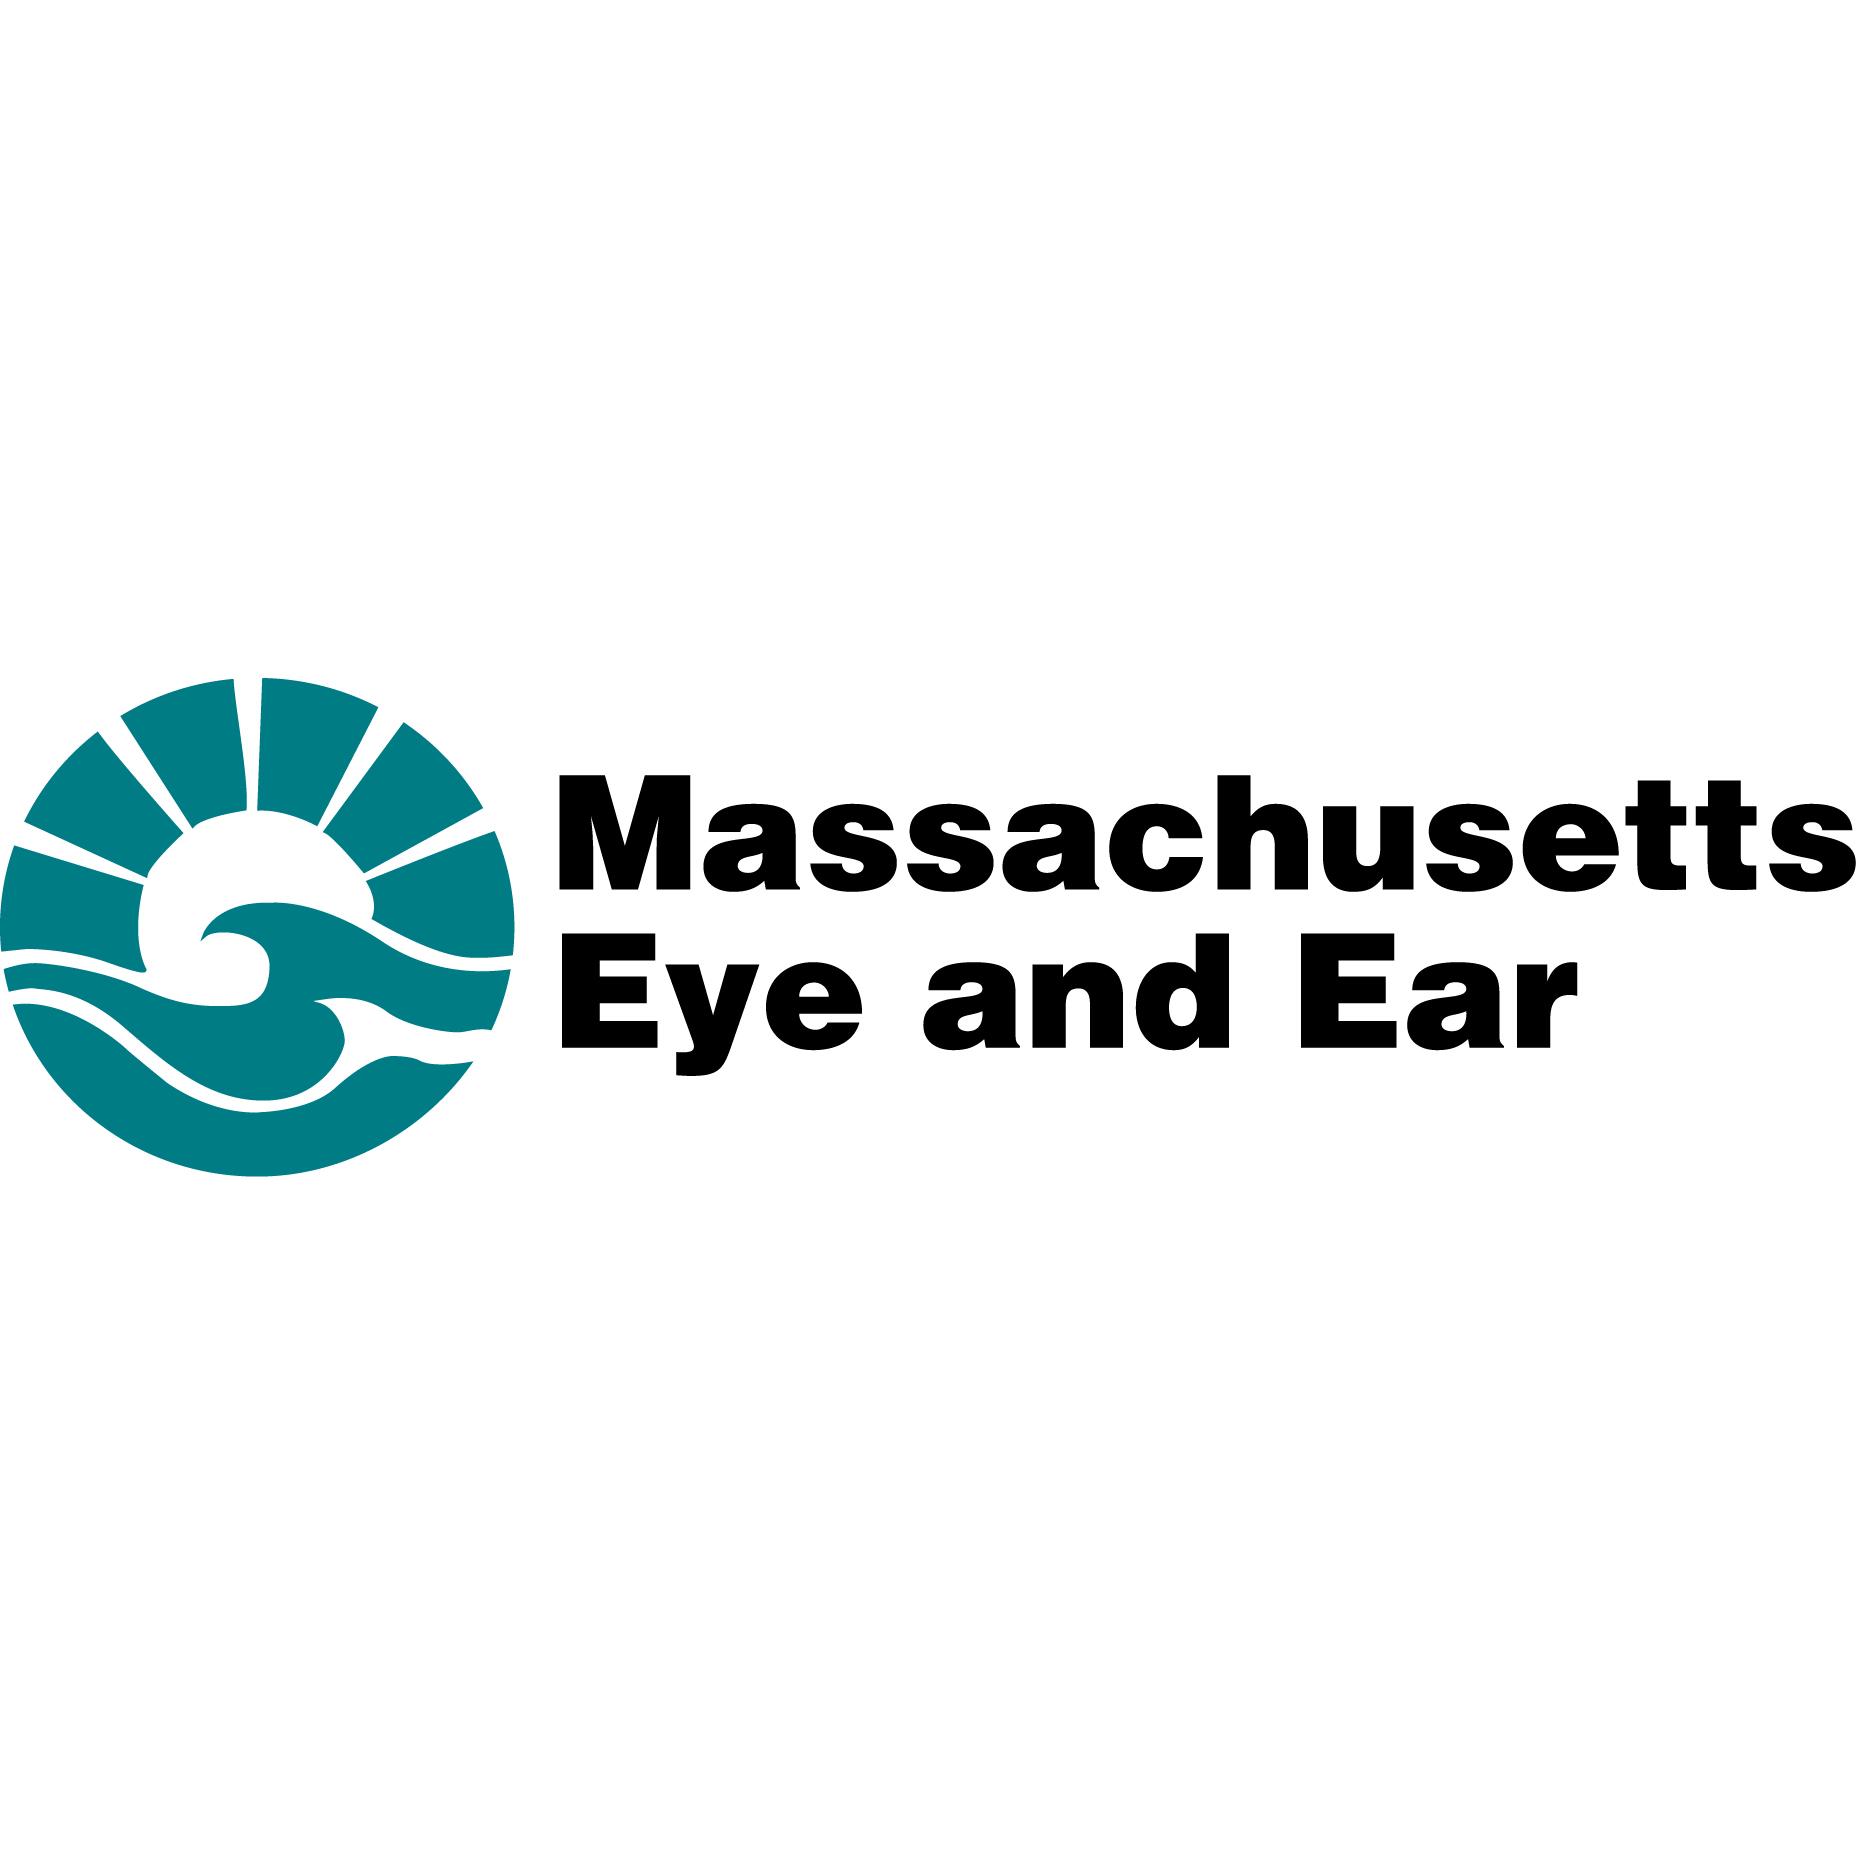 Massachusetts Eye and Ear - Boston, MA - Hospitals